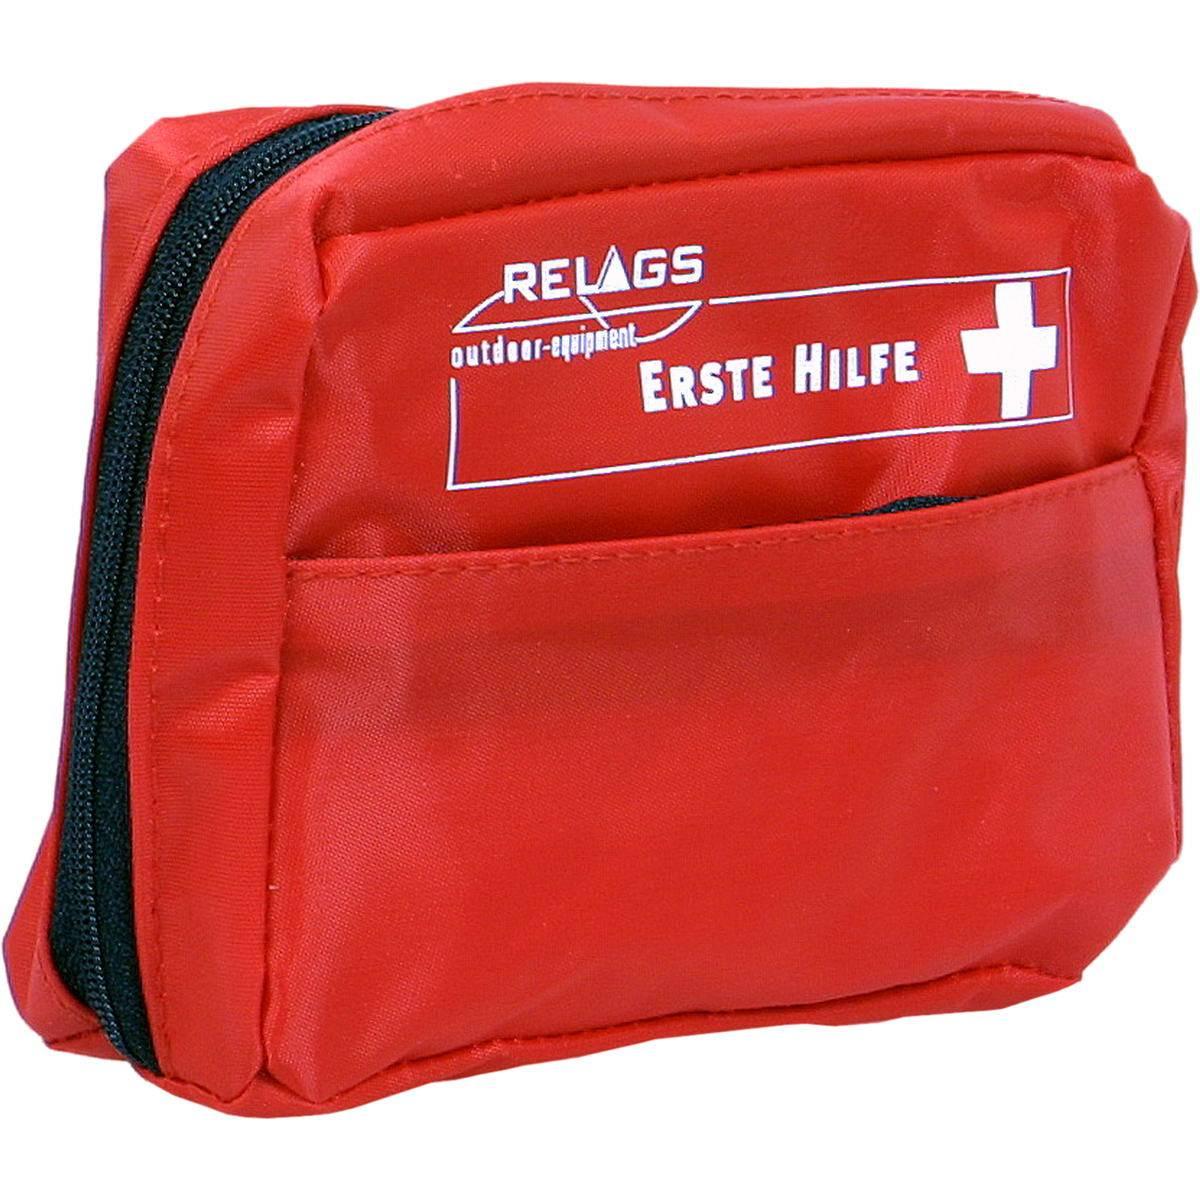 Relags Standard - Erste-Hilfe-Set